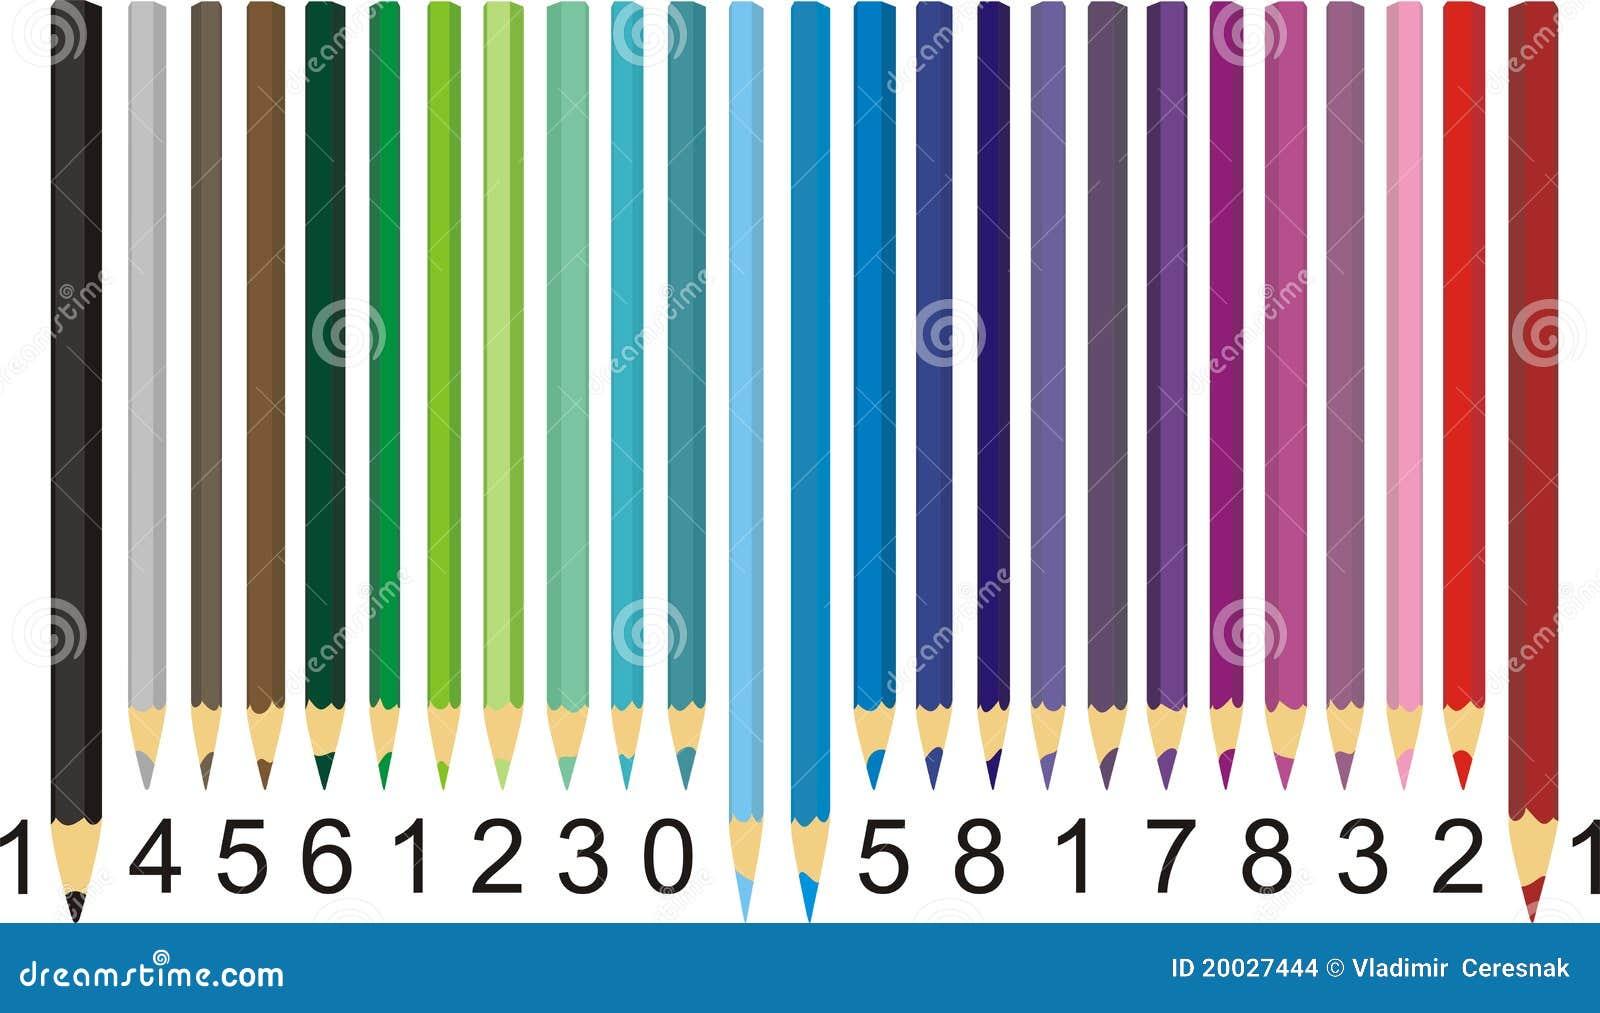 Fereditions31 Codigos De Barra Png: Color Pencil Barcode Stock Vector. Illustration Of Data